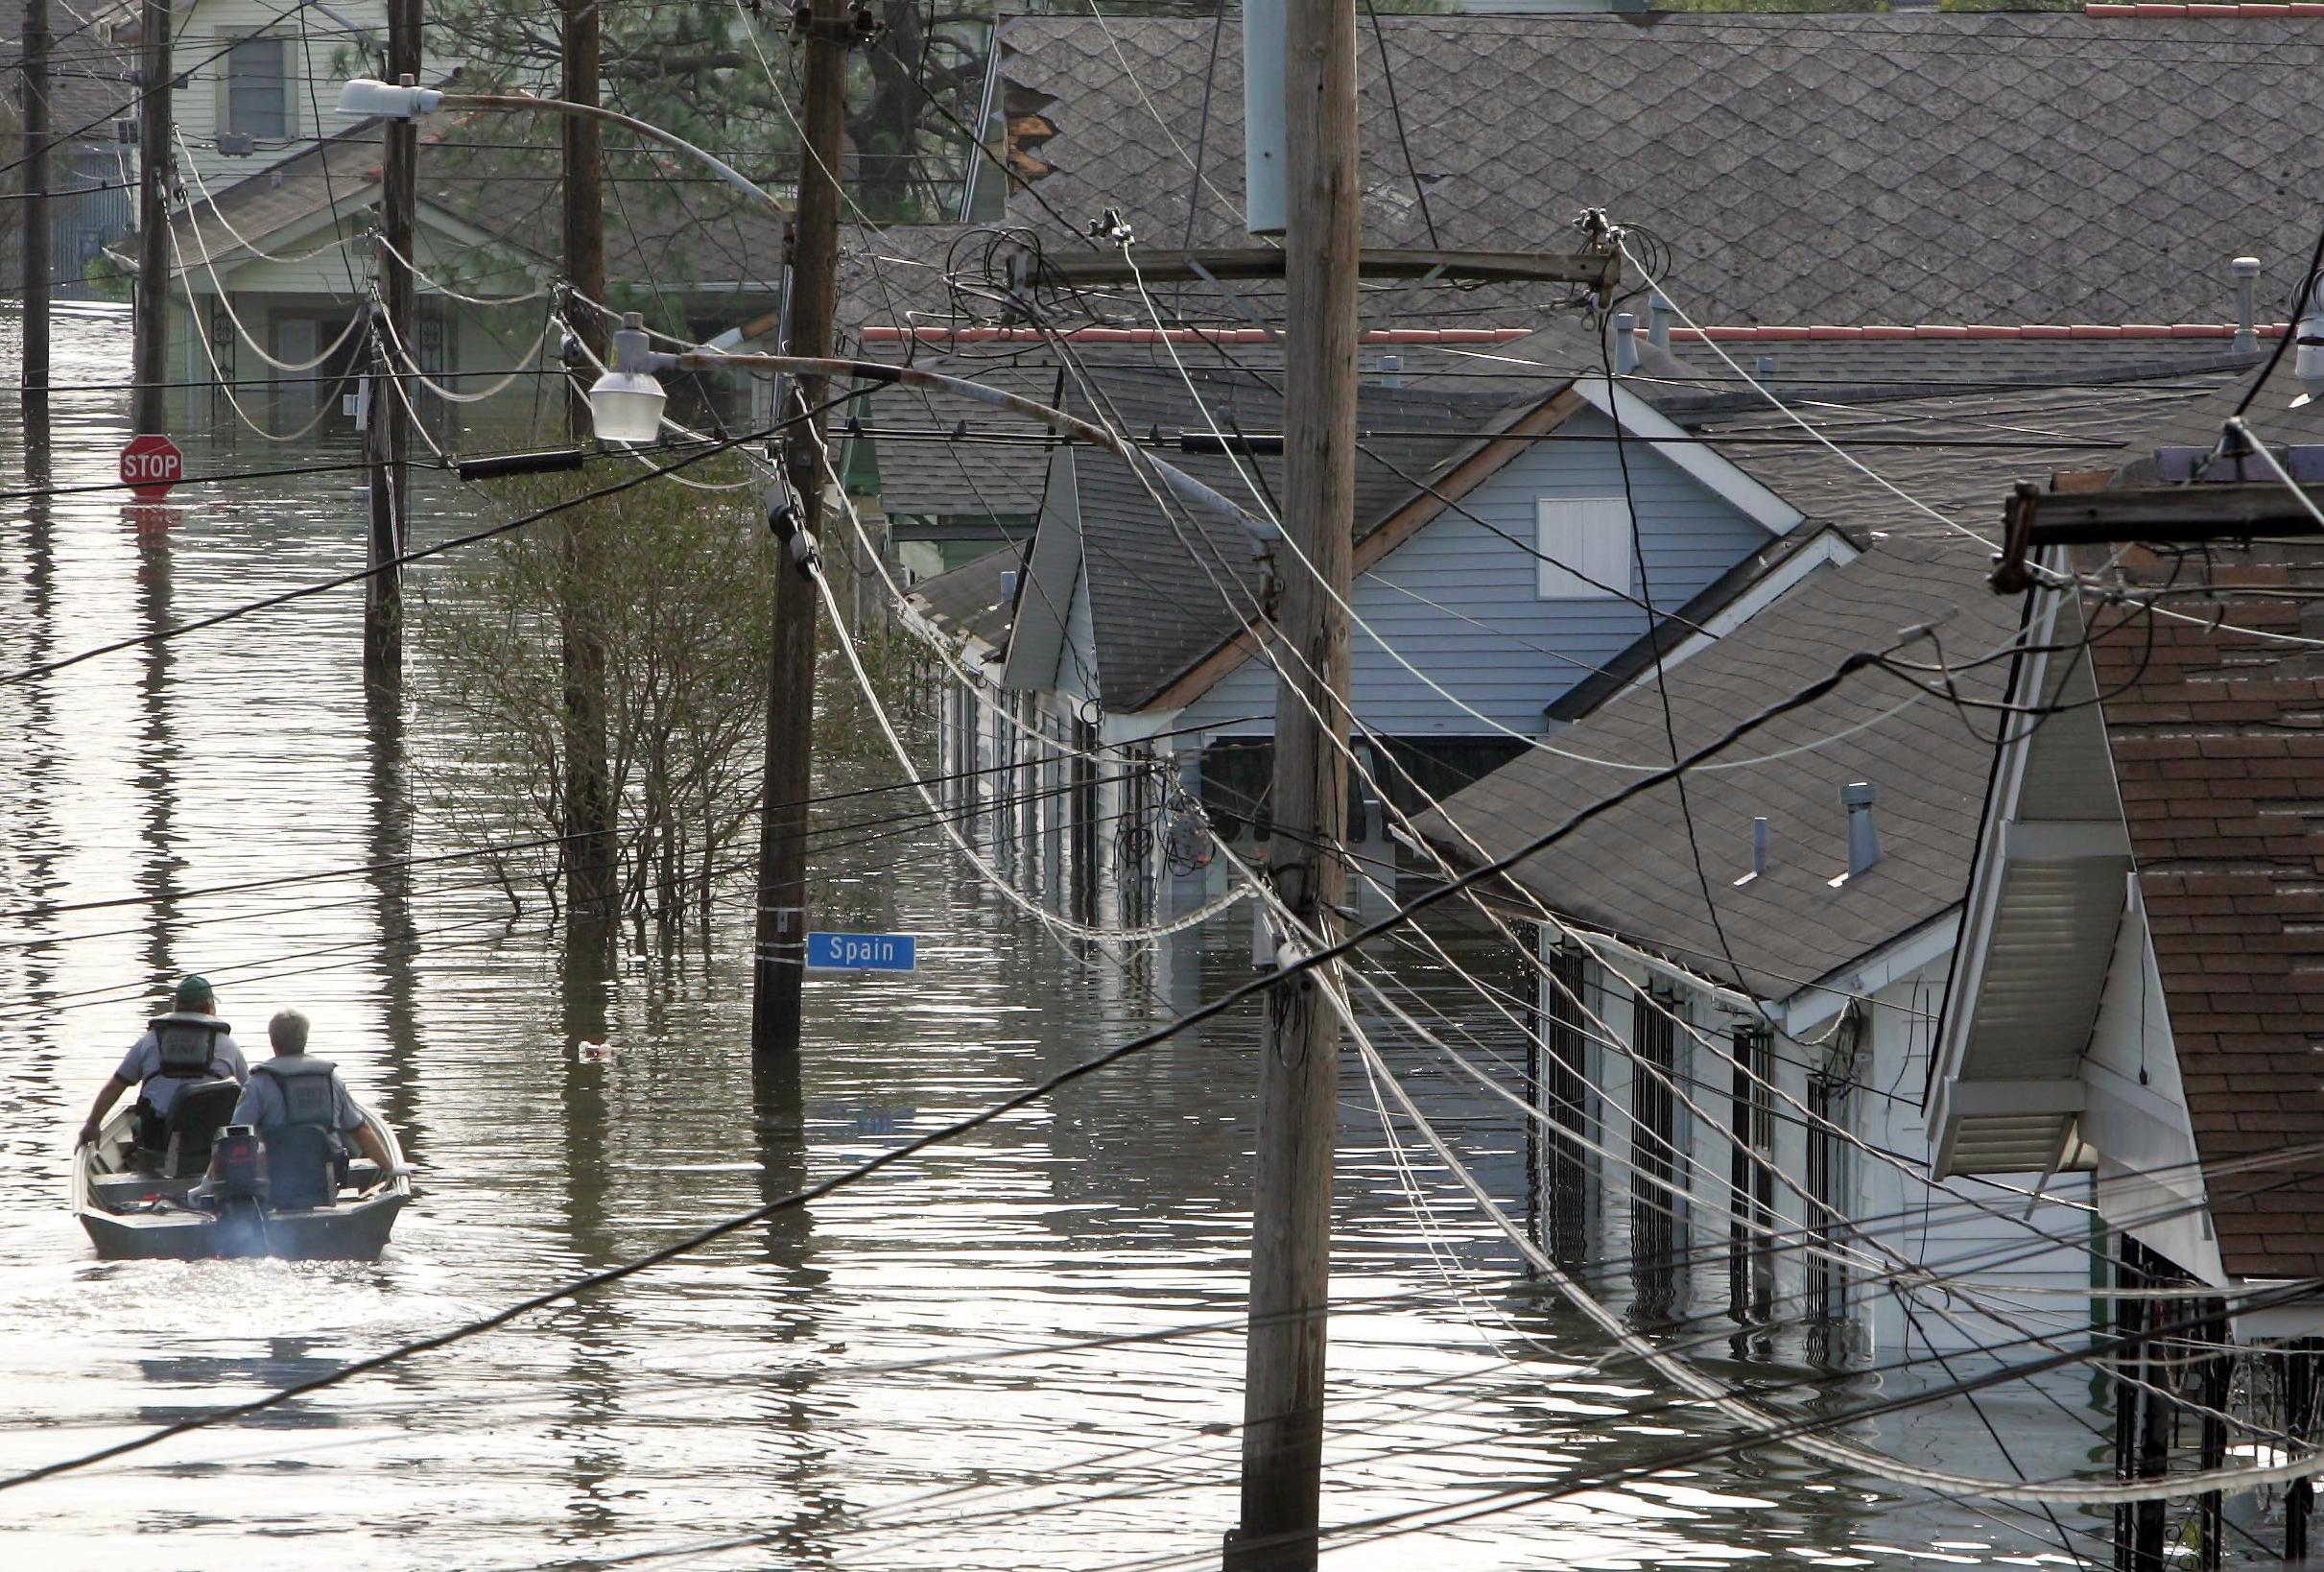 Rescuers-in-boat-NOLA-Katrina-AP_050827013918-Dave Martin